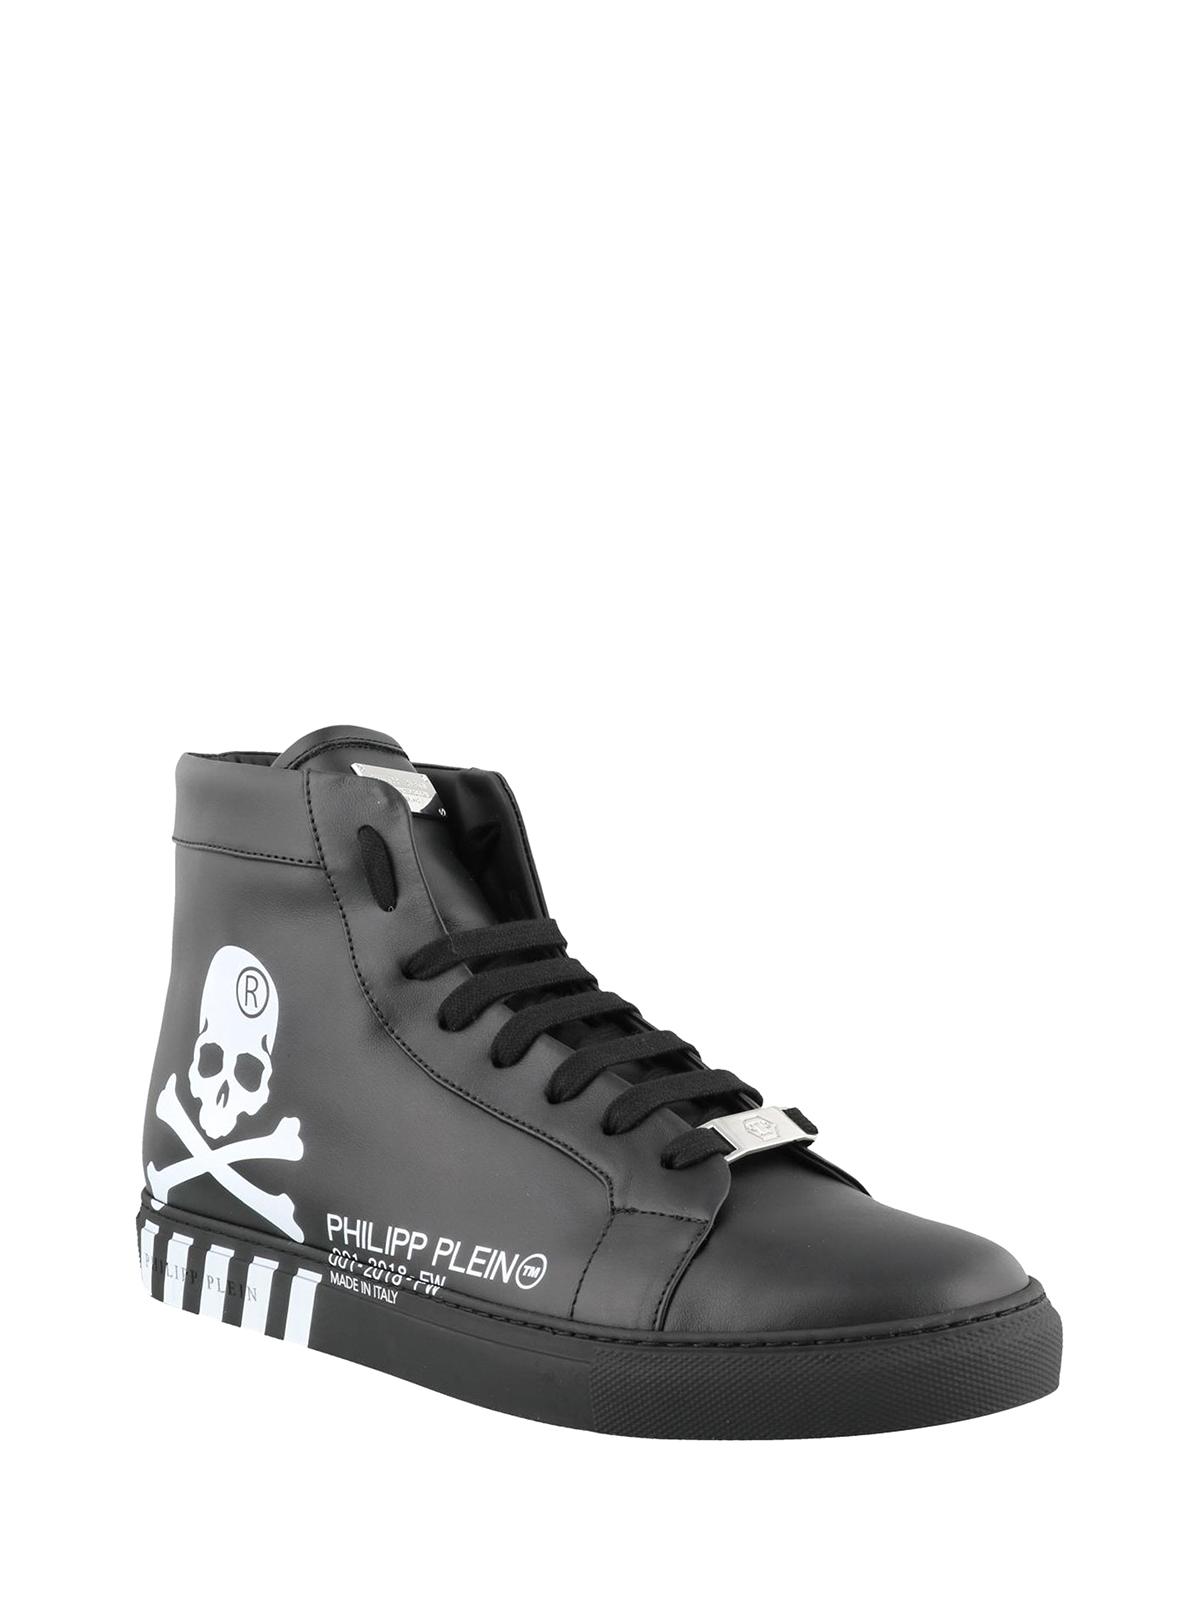 philipp plein sneakers high top